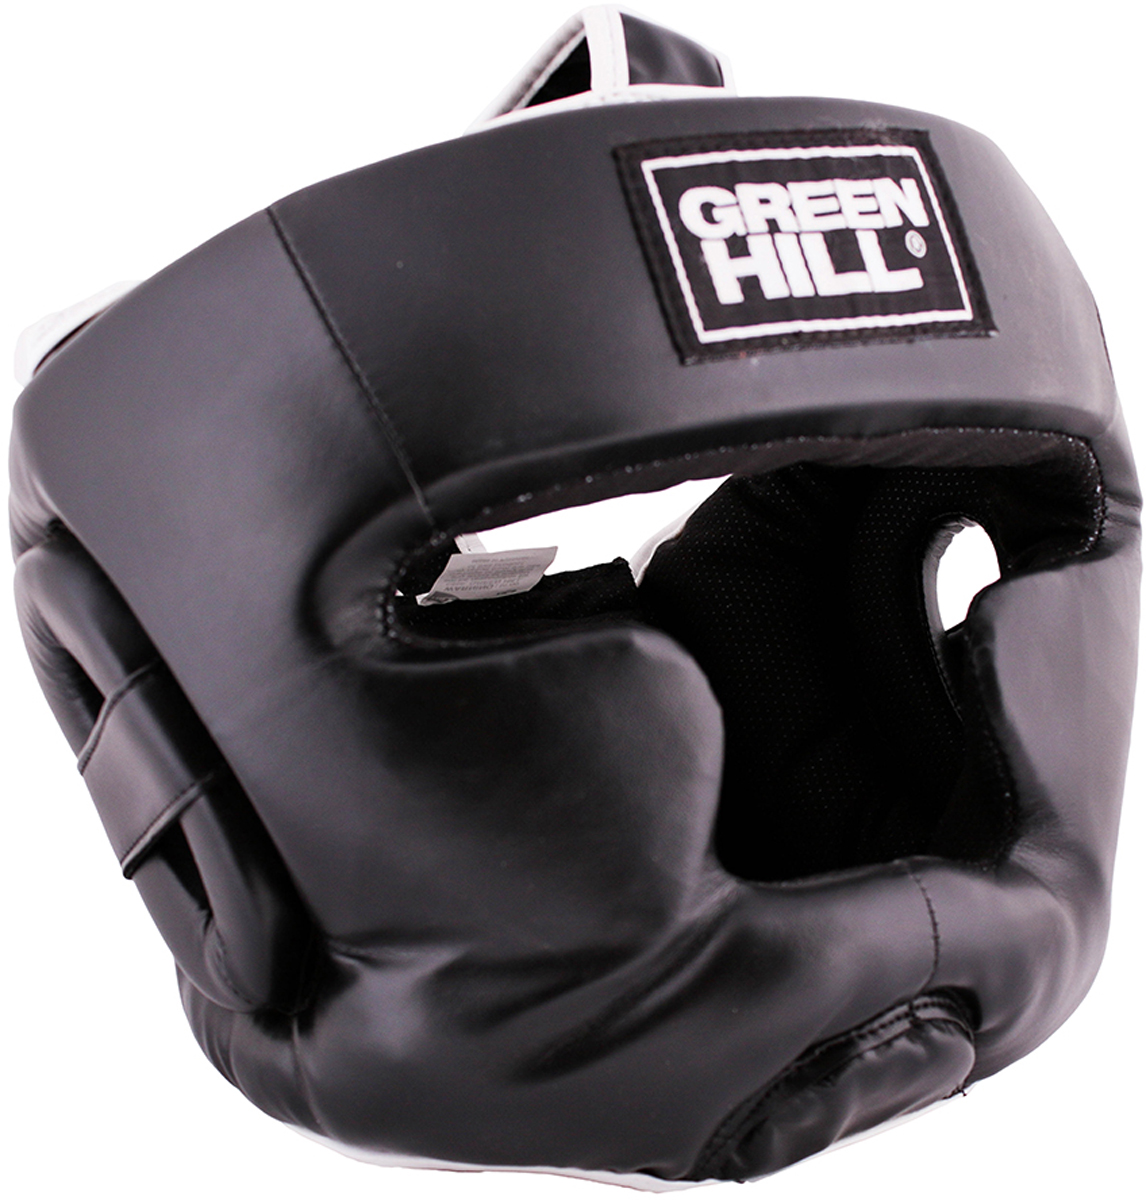 Шлем боксерский Green Hill  Warrior , цвет: черный. Размер L - Бокс